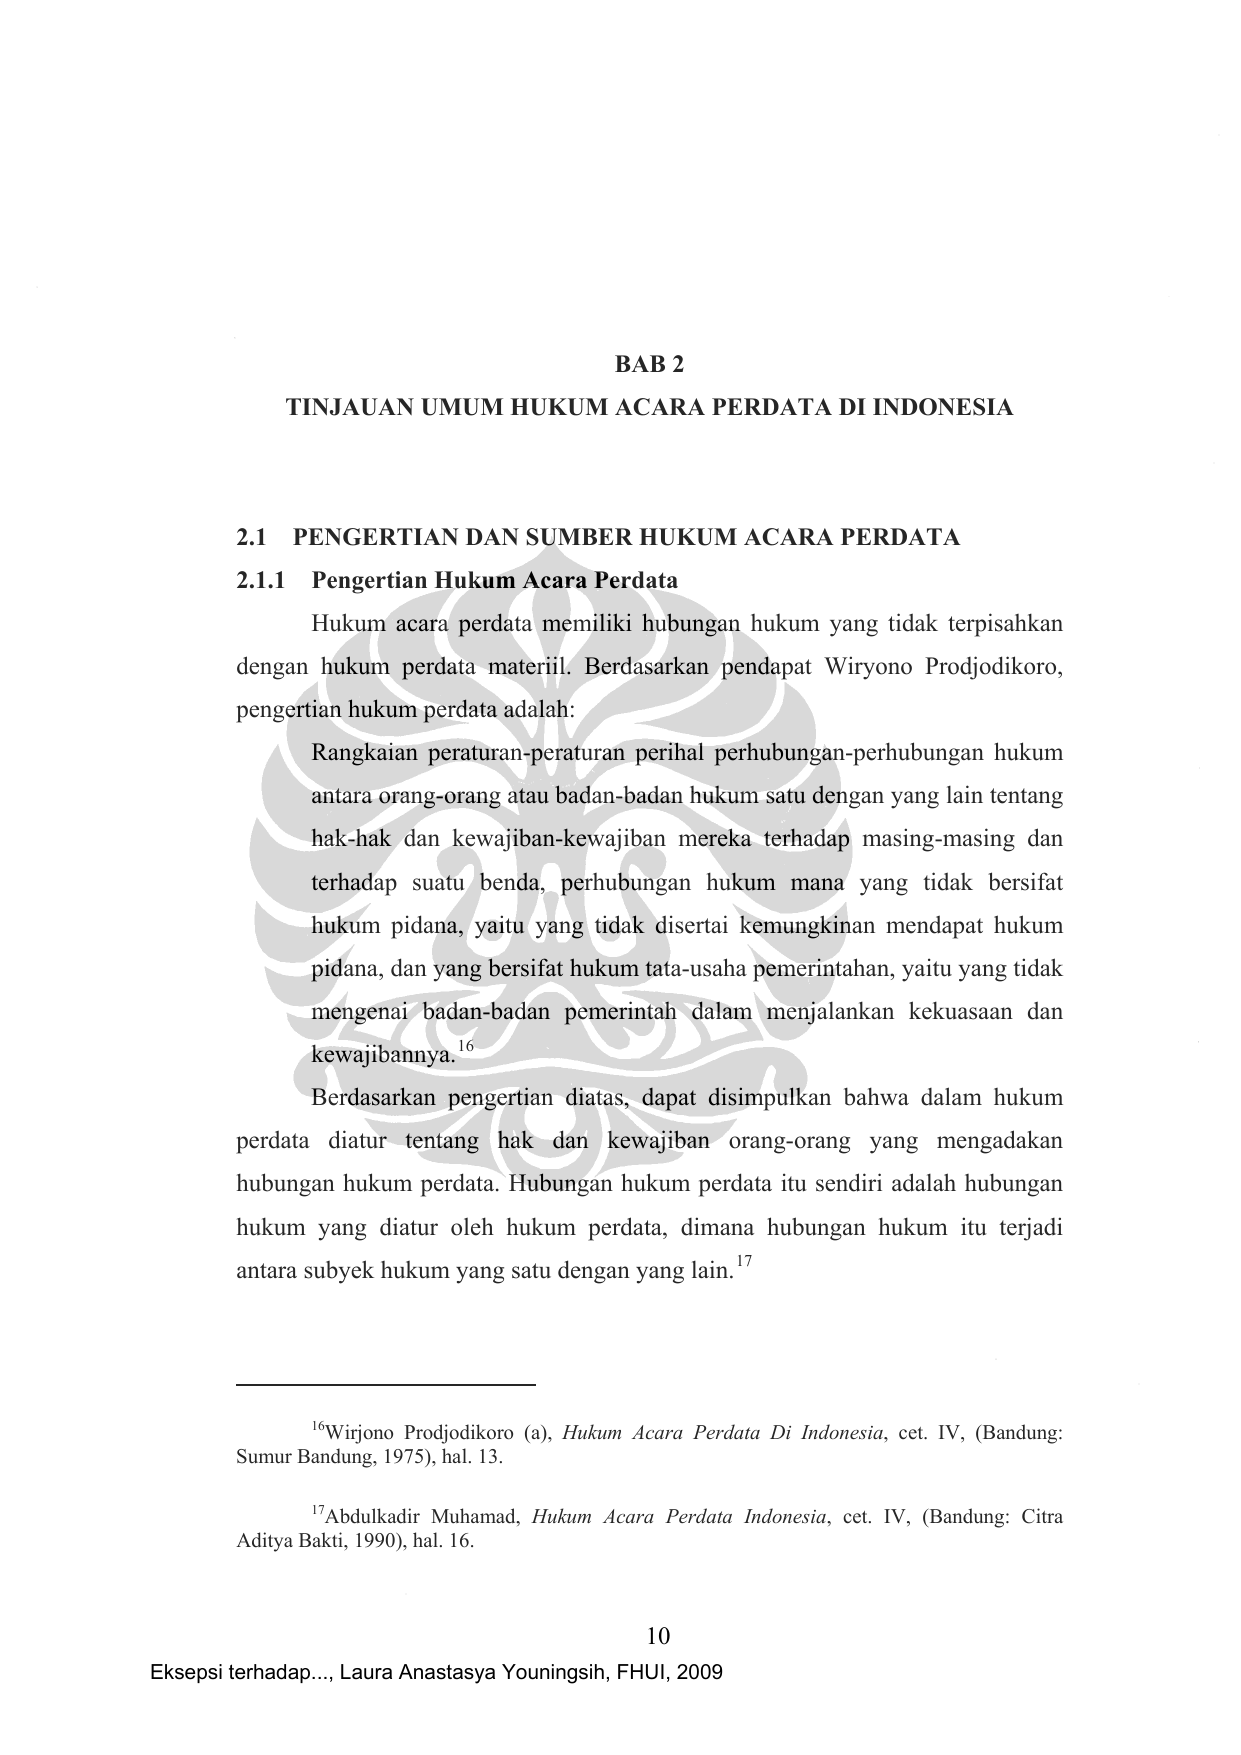 Bab 2 Tinjauan Umum Hukum Acara Perdata Di